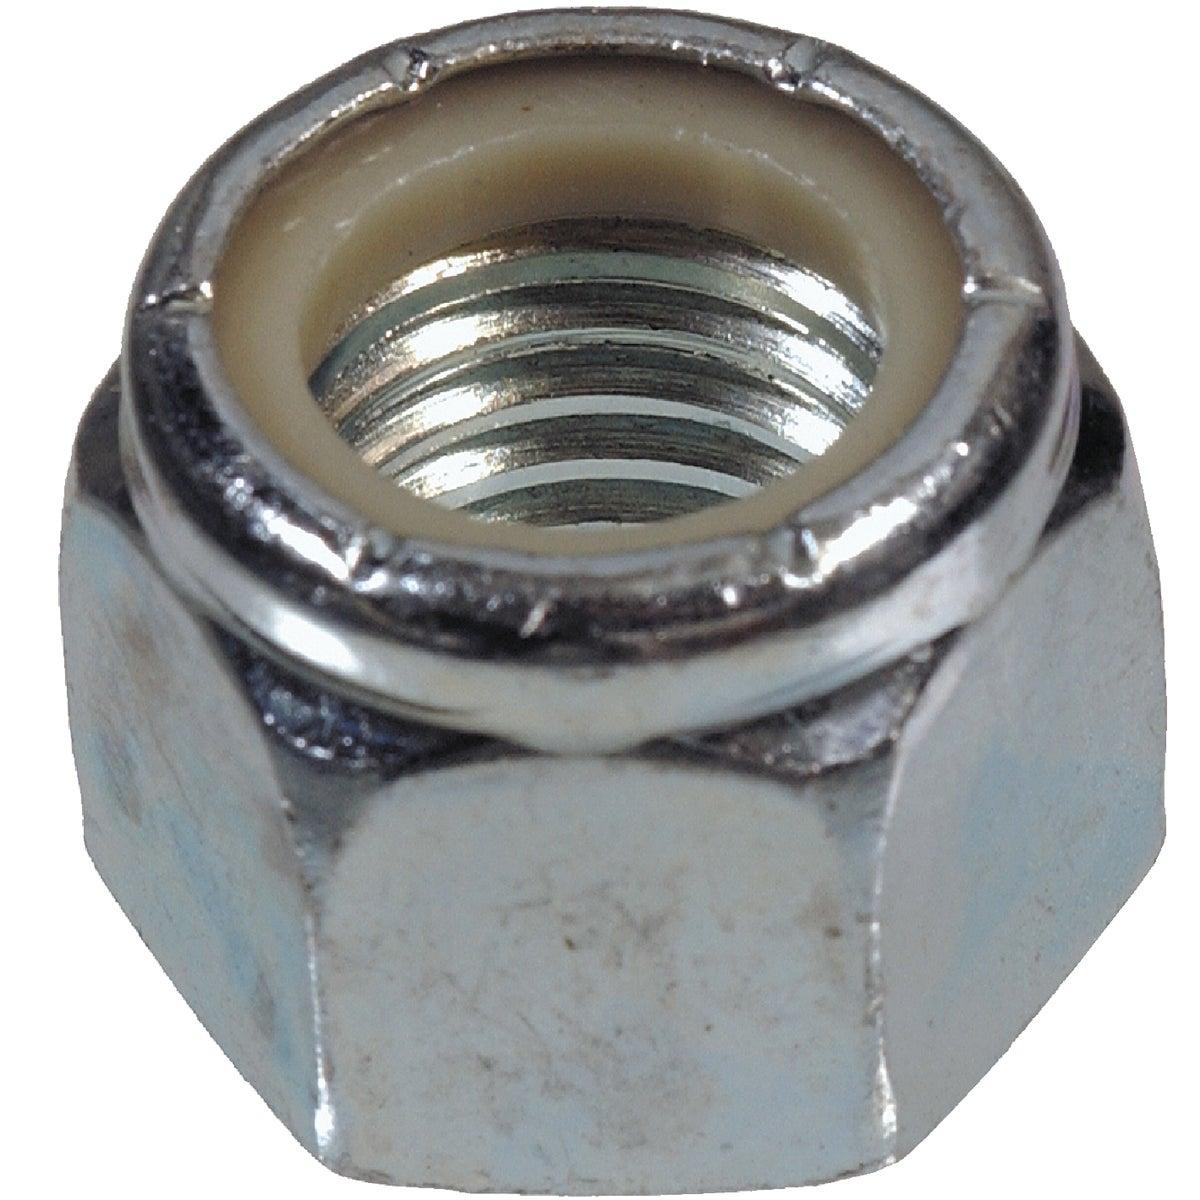 10-24 NYL INSRT LOCK NUT - 180141 by Hillman Fastener